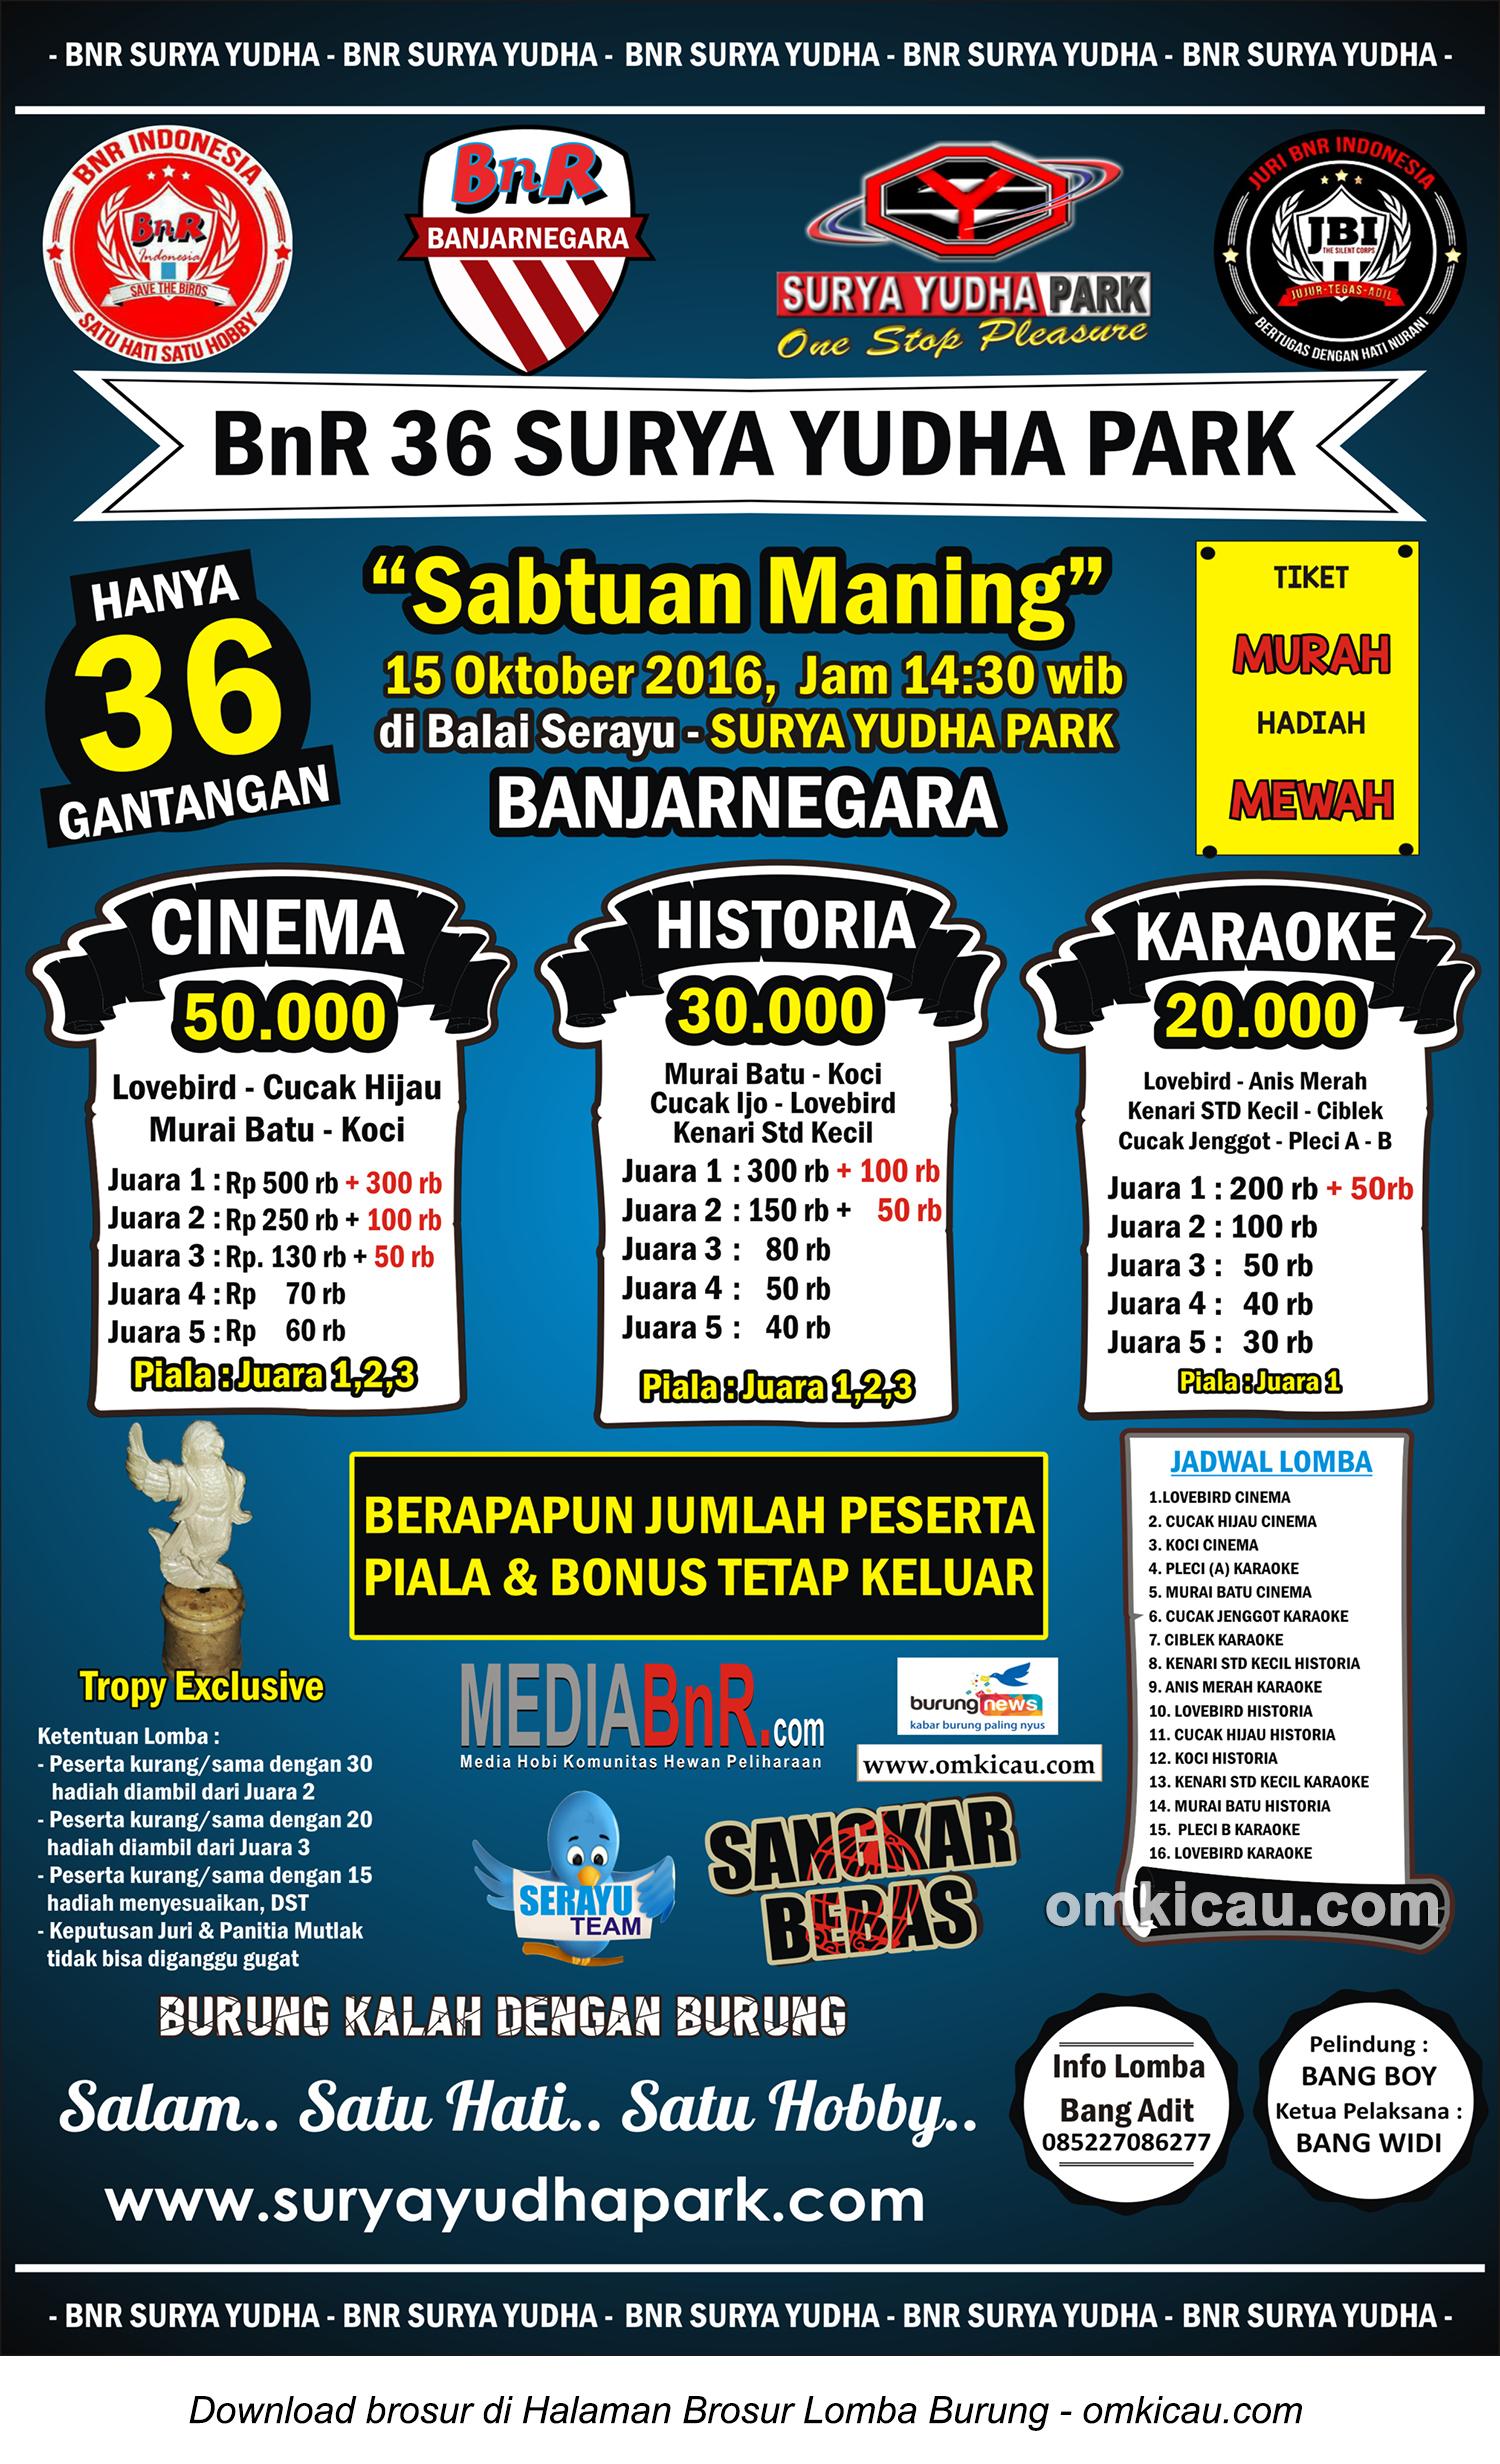 Latber Sabtuan Maning Bnr 36 Surya Yudha Park Banjarnegara 15